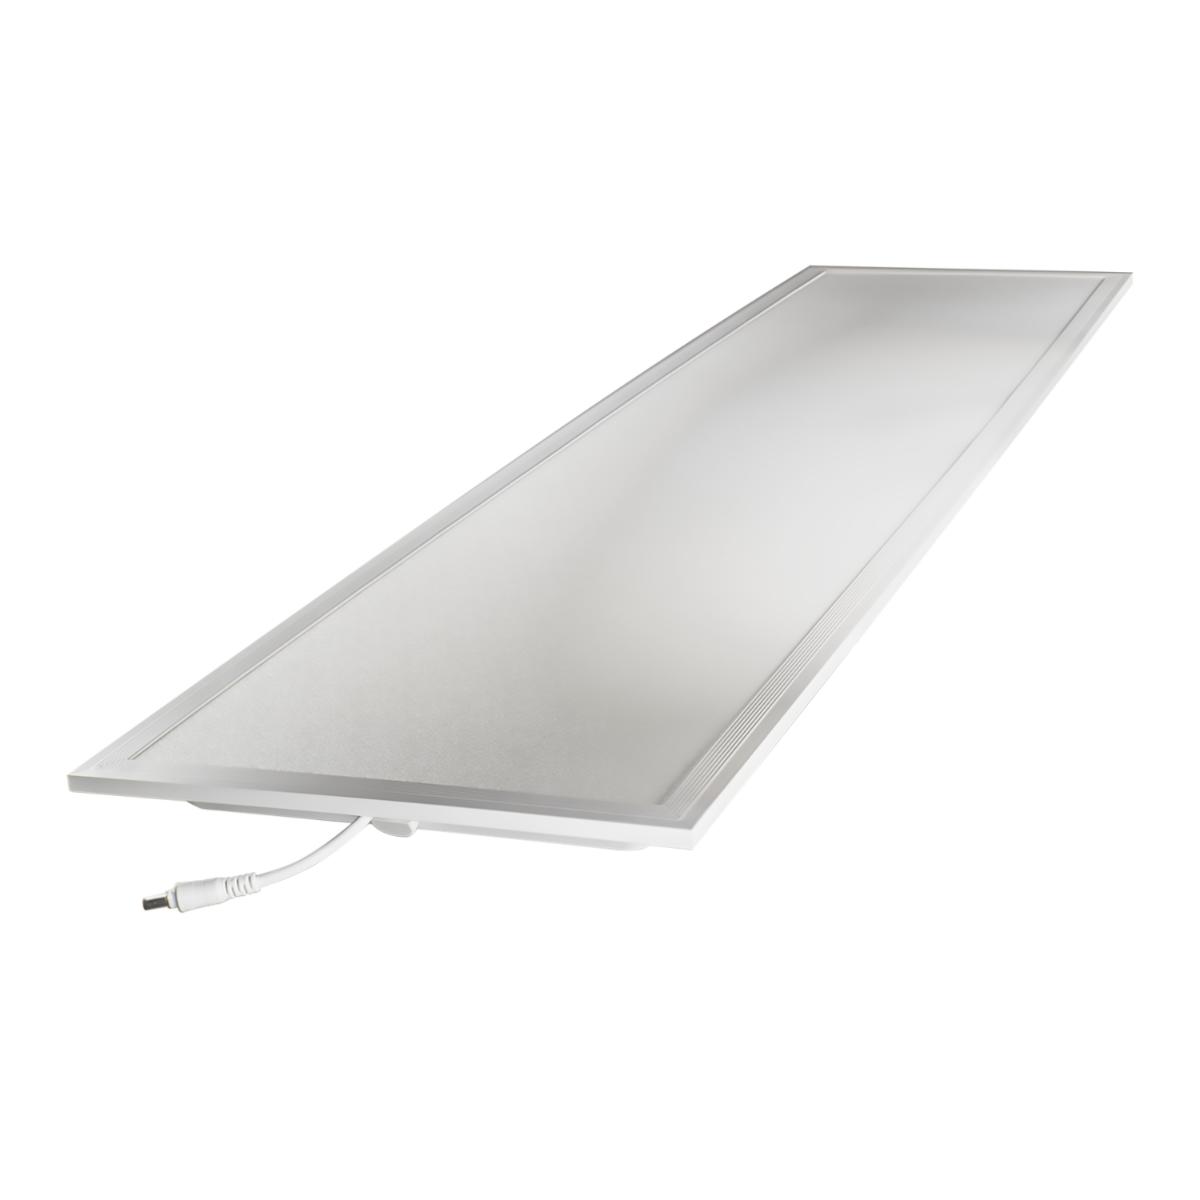 Noxion LED panel Econox 32W Xitanium DALI 30x120cm 3000K 3900lm UGR <22 | Dali dæmpbar - varm hvid - erstatter 2x36W